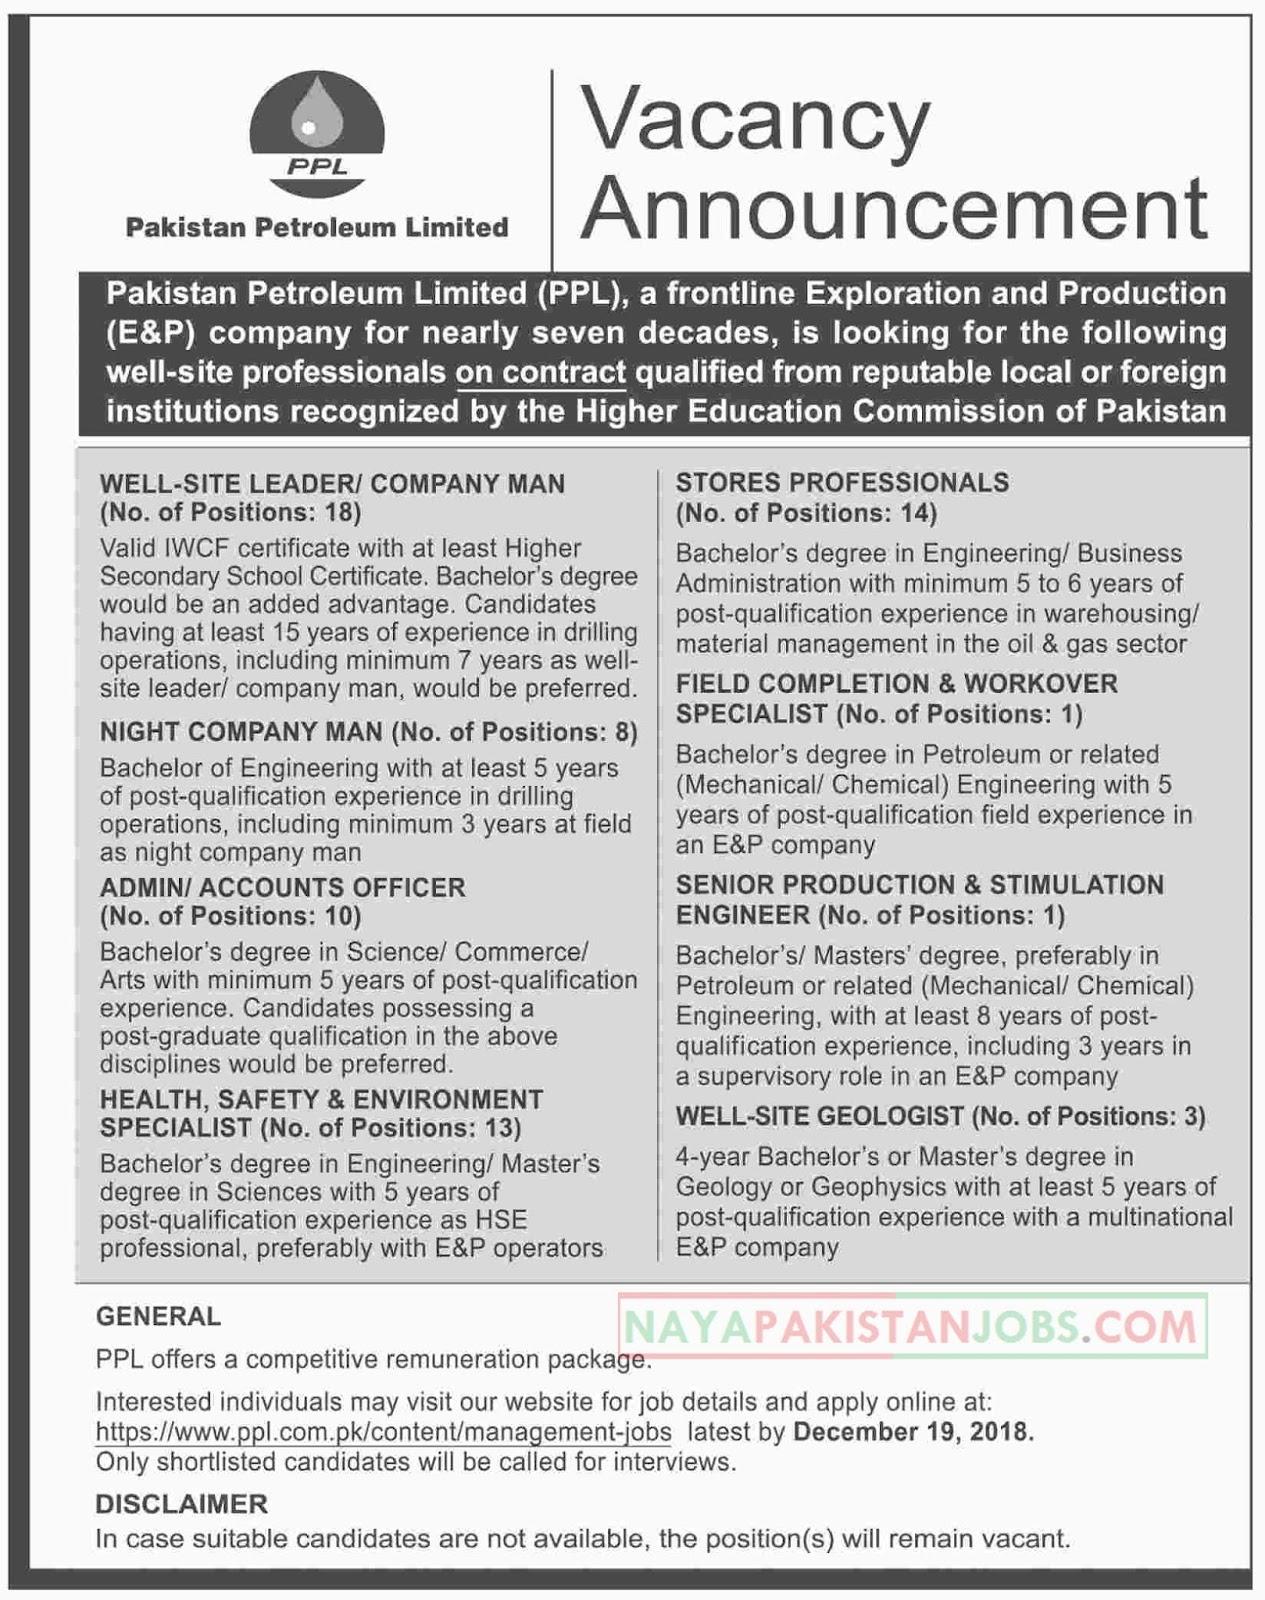 Pakistan Petroleum Limited PPL Jobs Dec 2018, oil and gas jobs, ppl.com.pk jobs